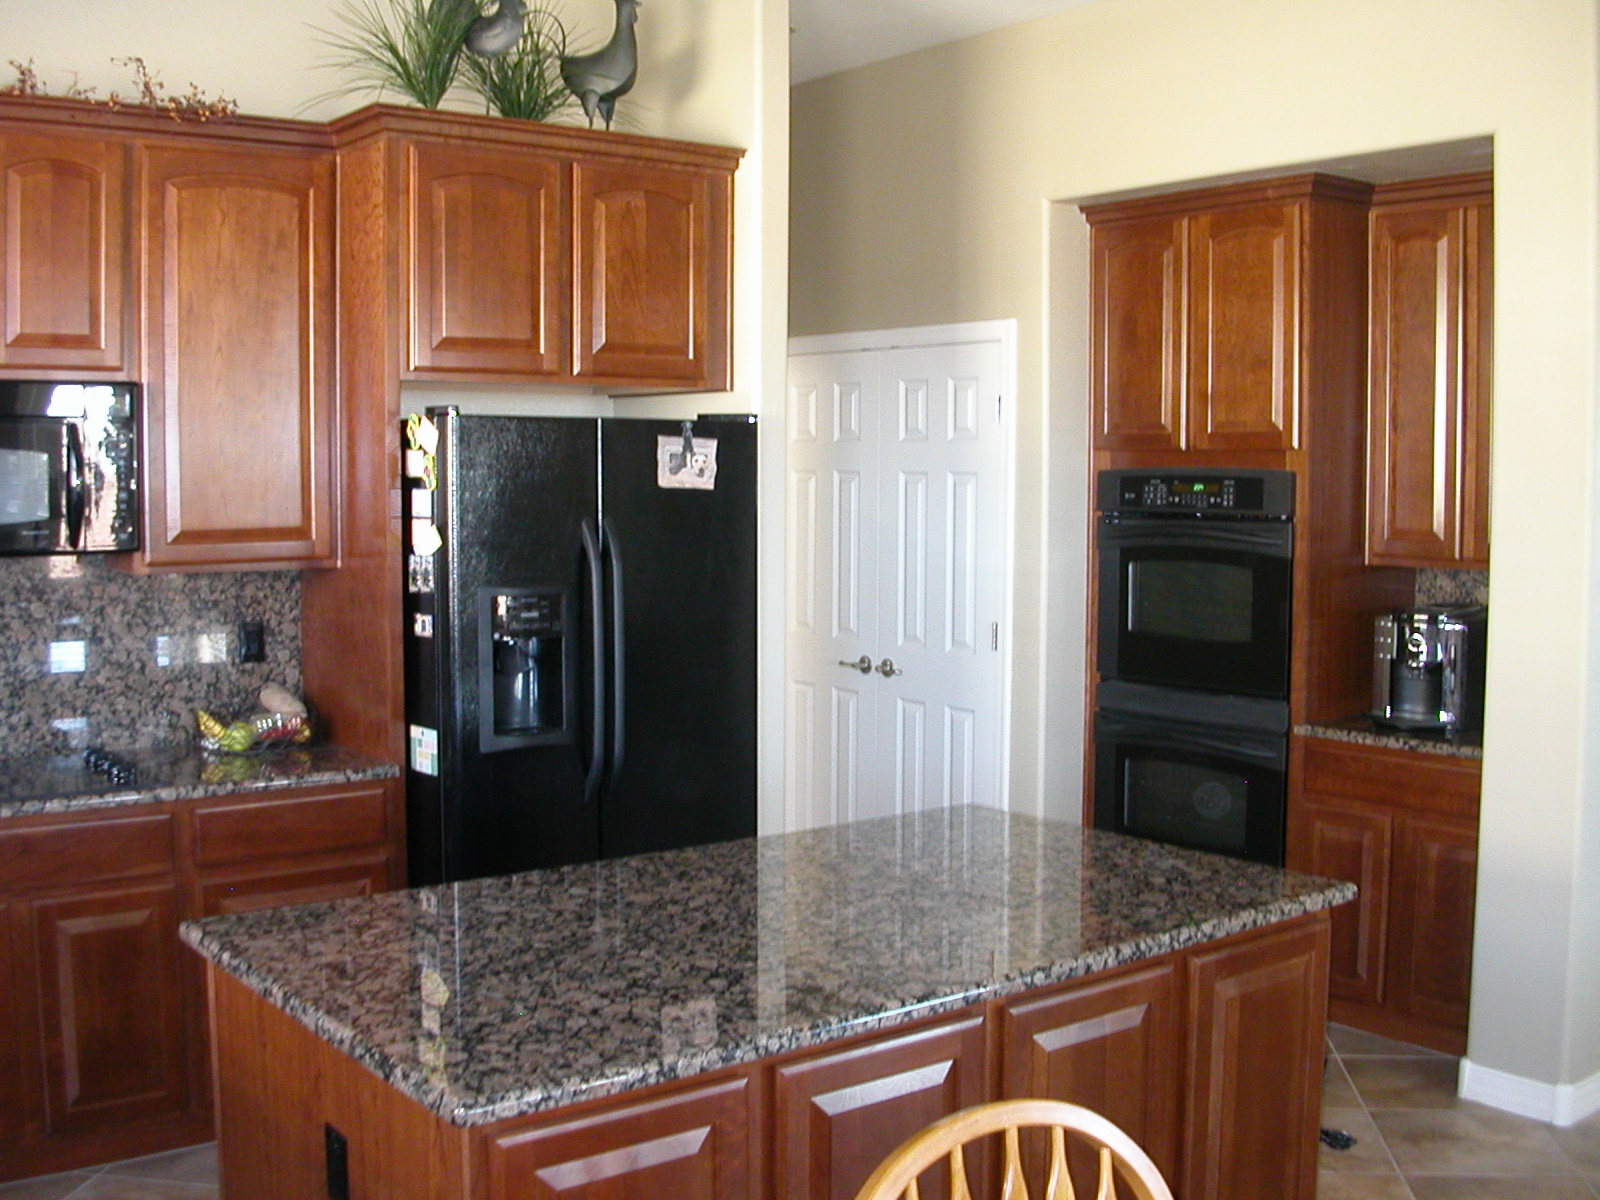 Black Vs Stainless Steel Appliances (flooring, Cleaning